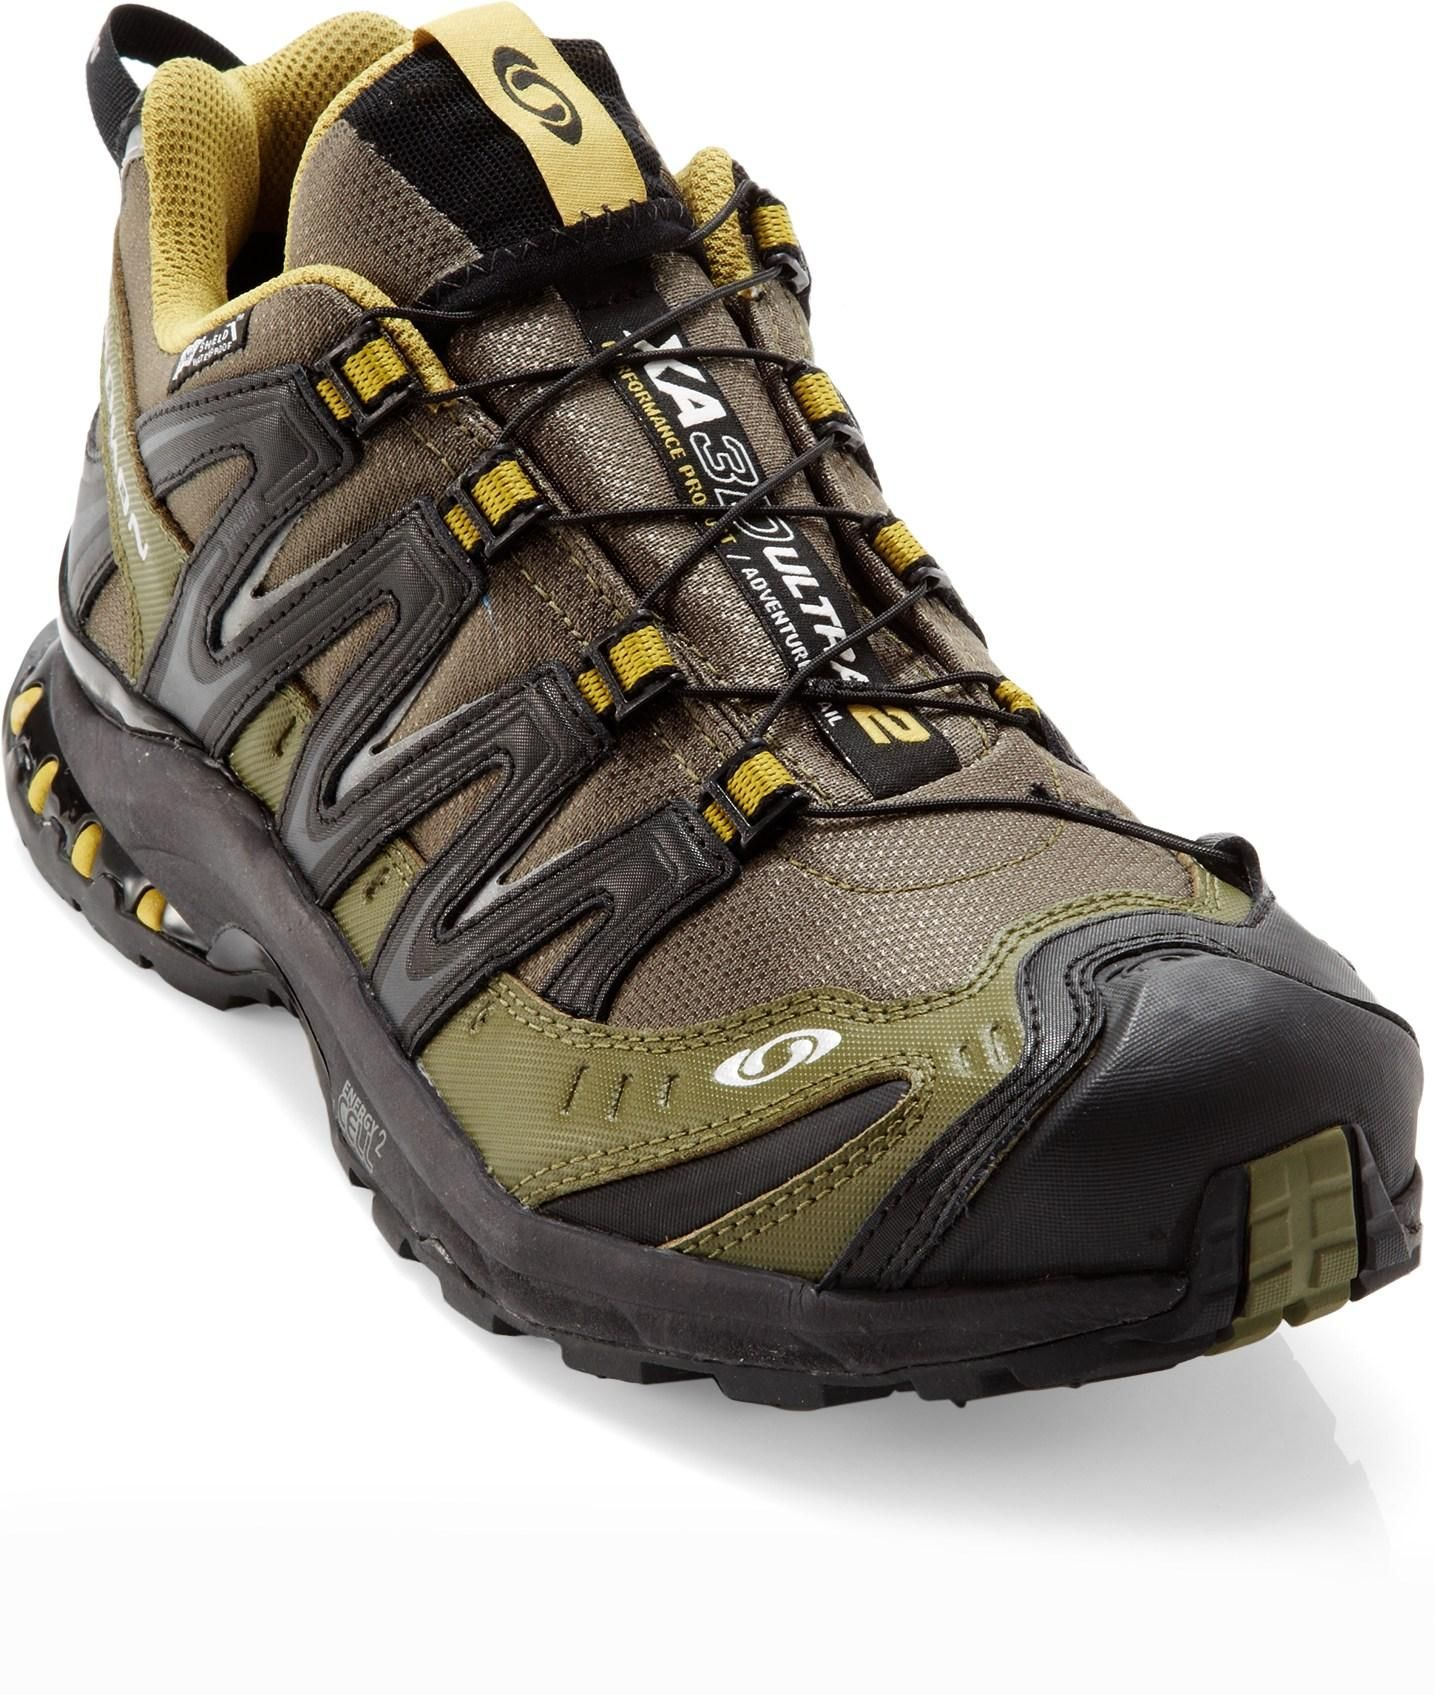 Salomon Xa Pro 3d Ultra Cs Wp Trail Running Shoes Men S Rei Co Op Mens Trail Running Shoes Shoes Mens Best Trail Running Shoes